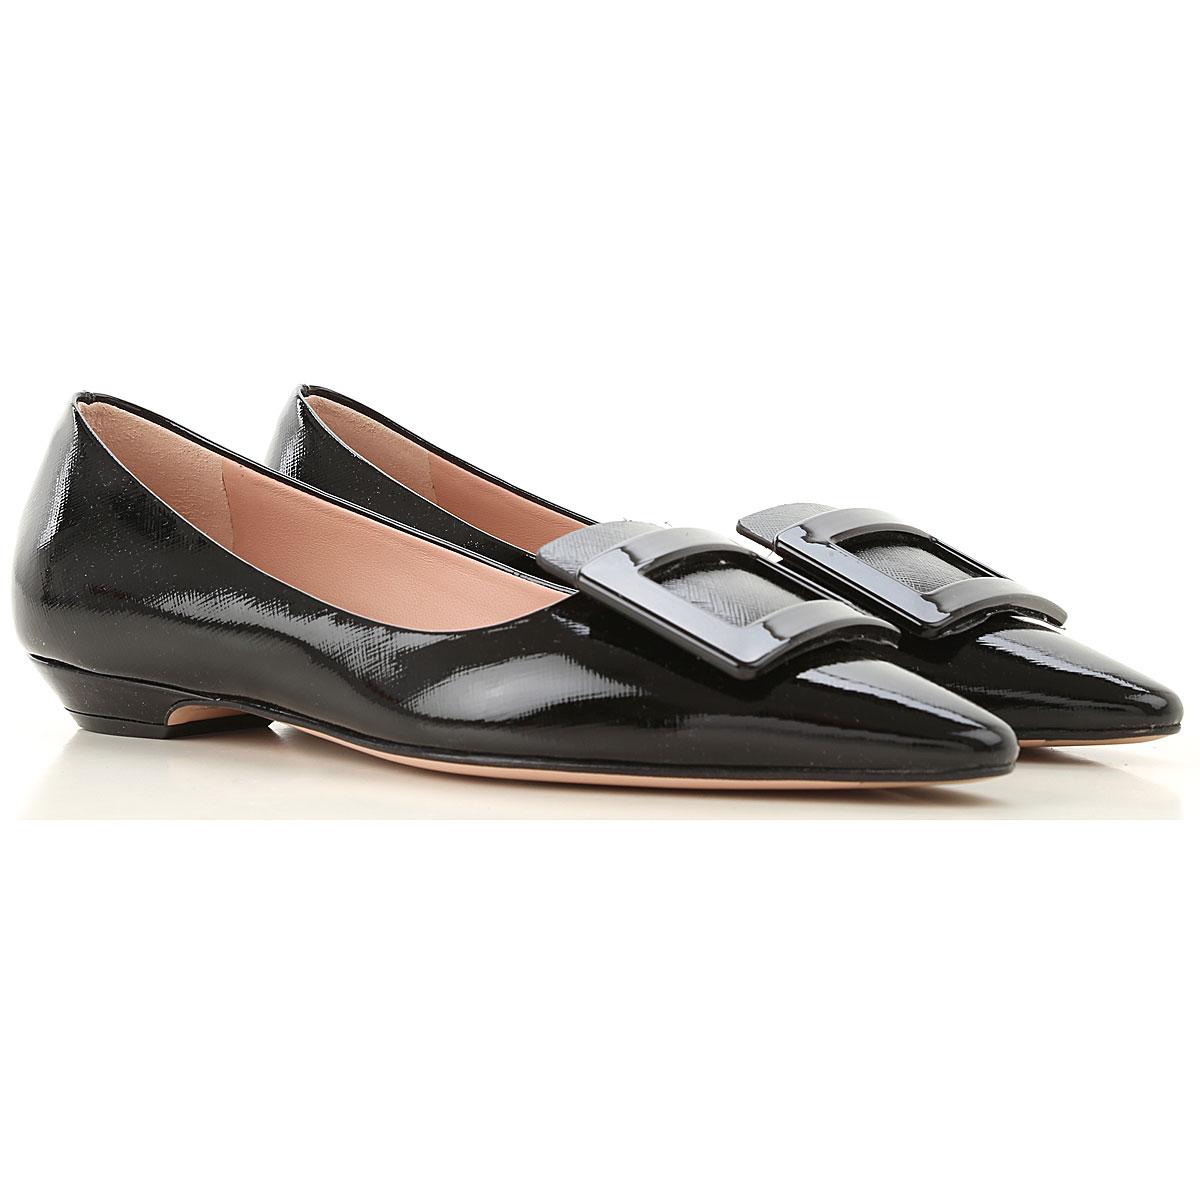 Roberto Festa Ballet Flats Ballerina Shoes for Women On Sale, Black, Patent Leather, 2019, 6 7